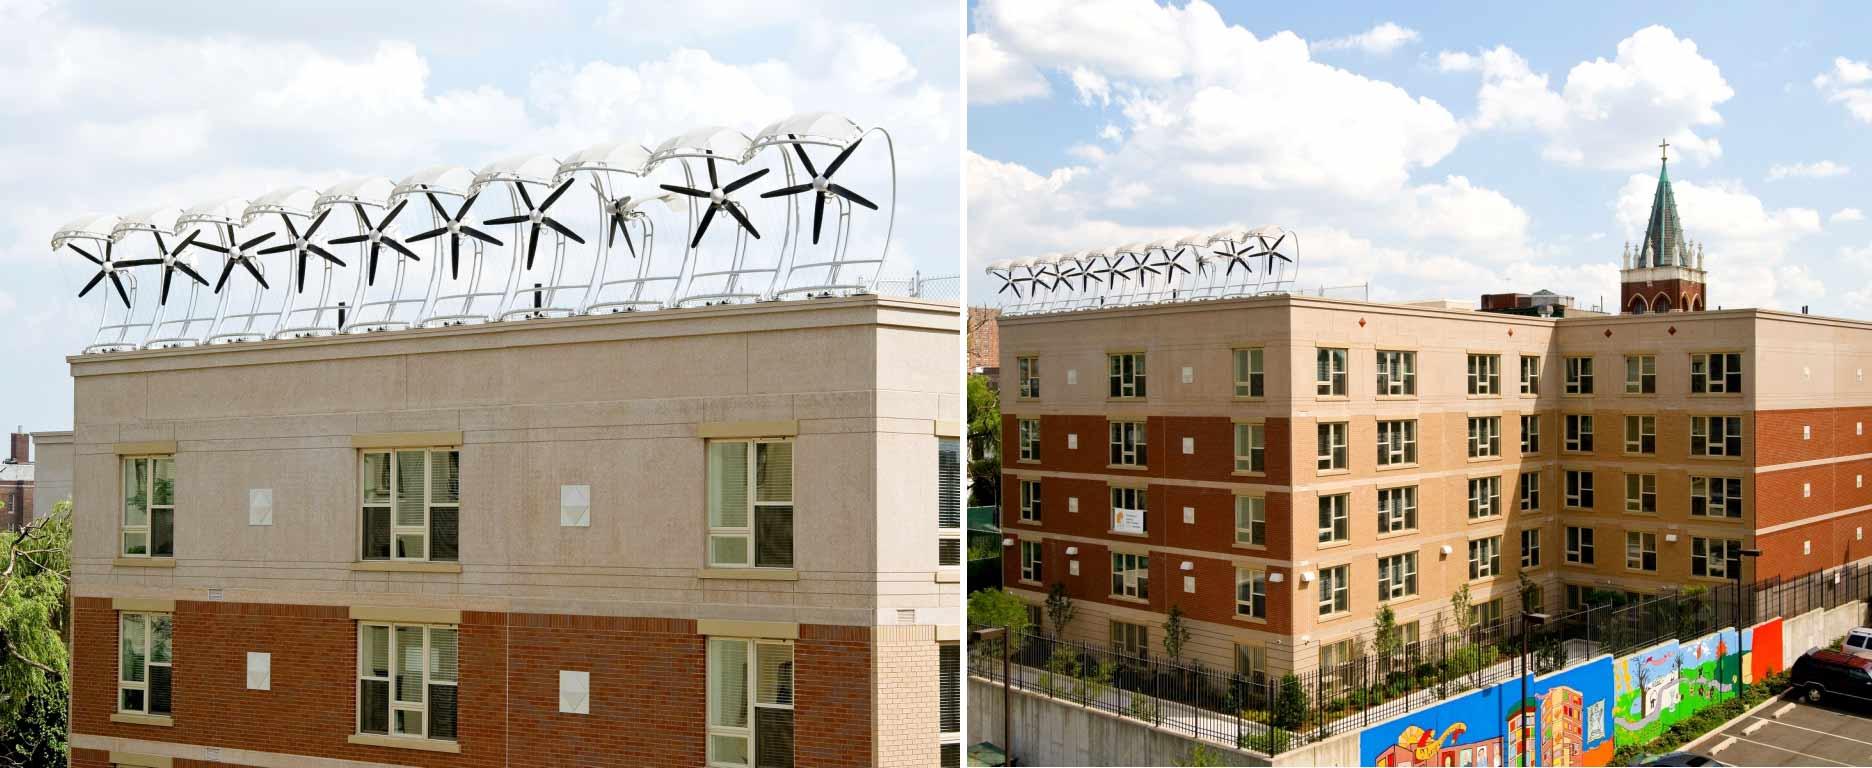 Roof Turbine Ventilator - China Ventilation Fan, Wind Turbine